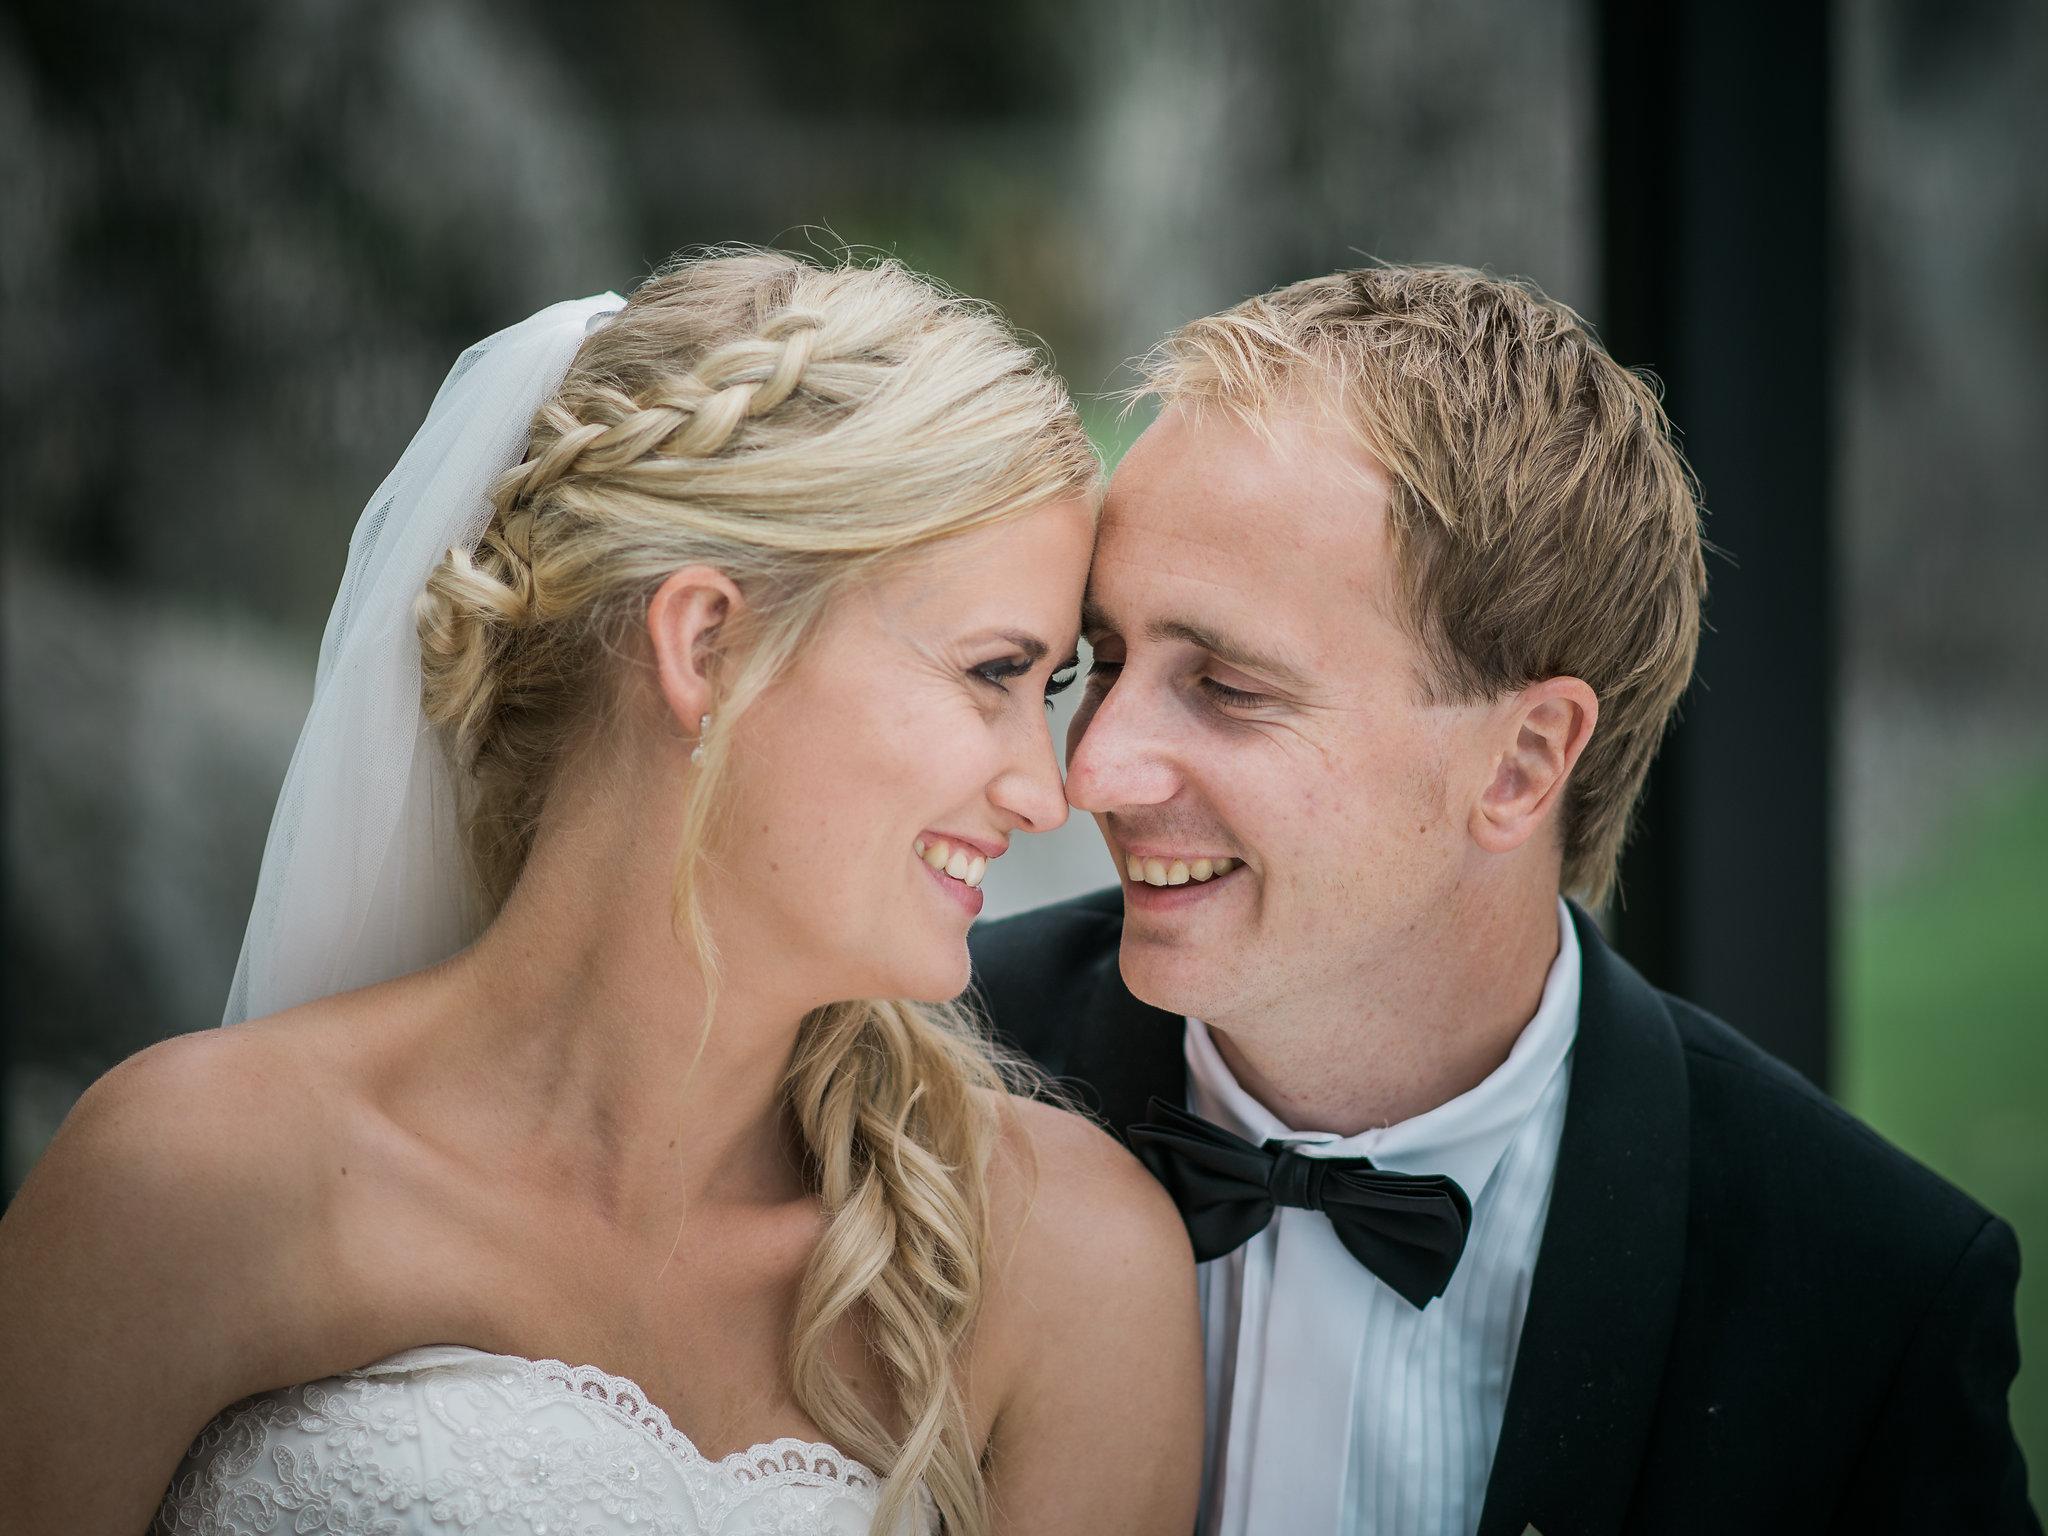 _6007632-2fotograf-bryllup-tyrifjorden.jpg